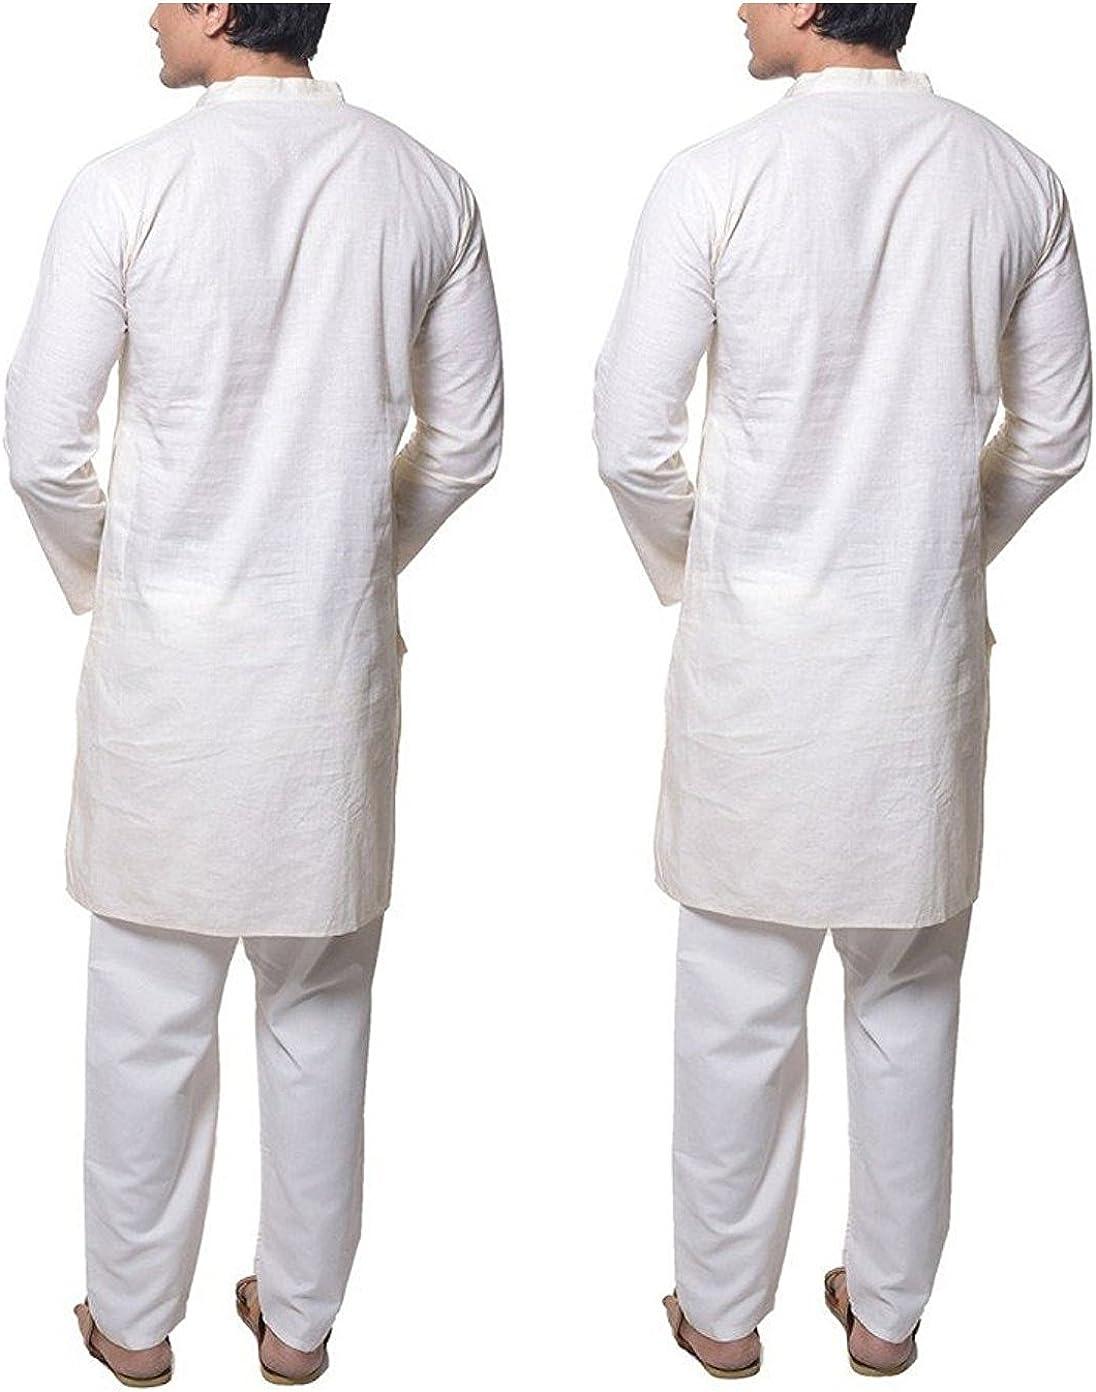 Royal Men's White Active Wear Pure Cotton Kurta Pyjama Set of 2